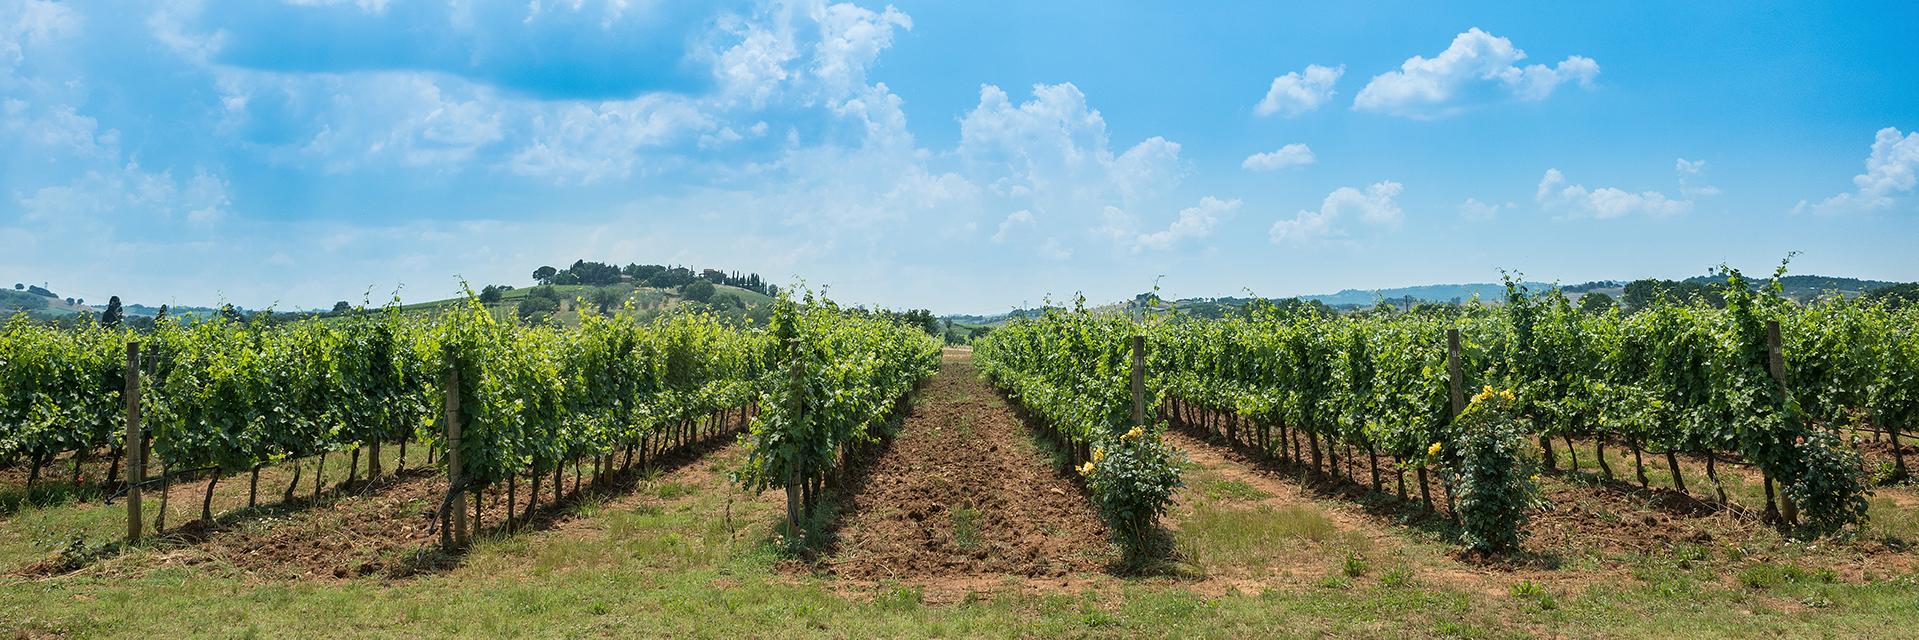 vineyardwide